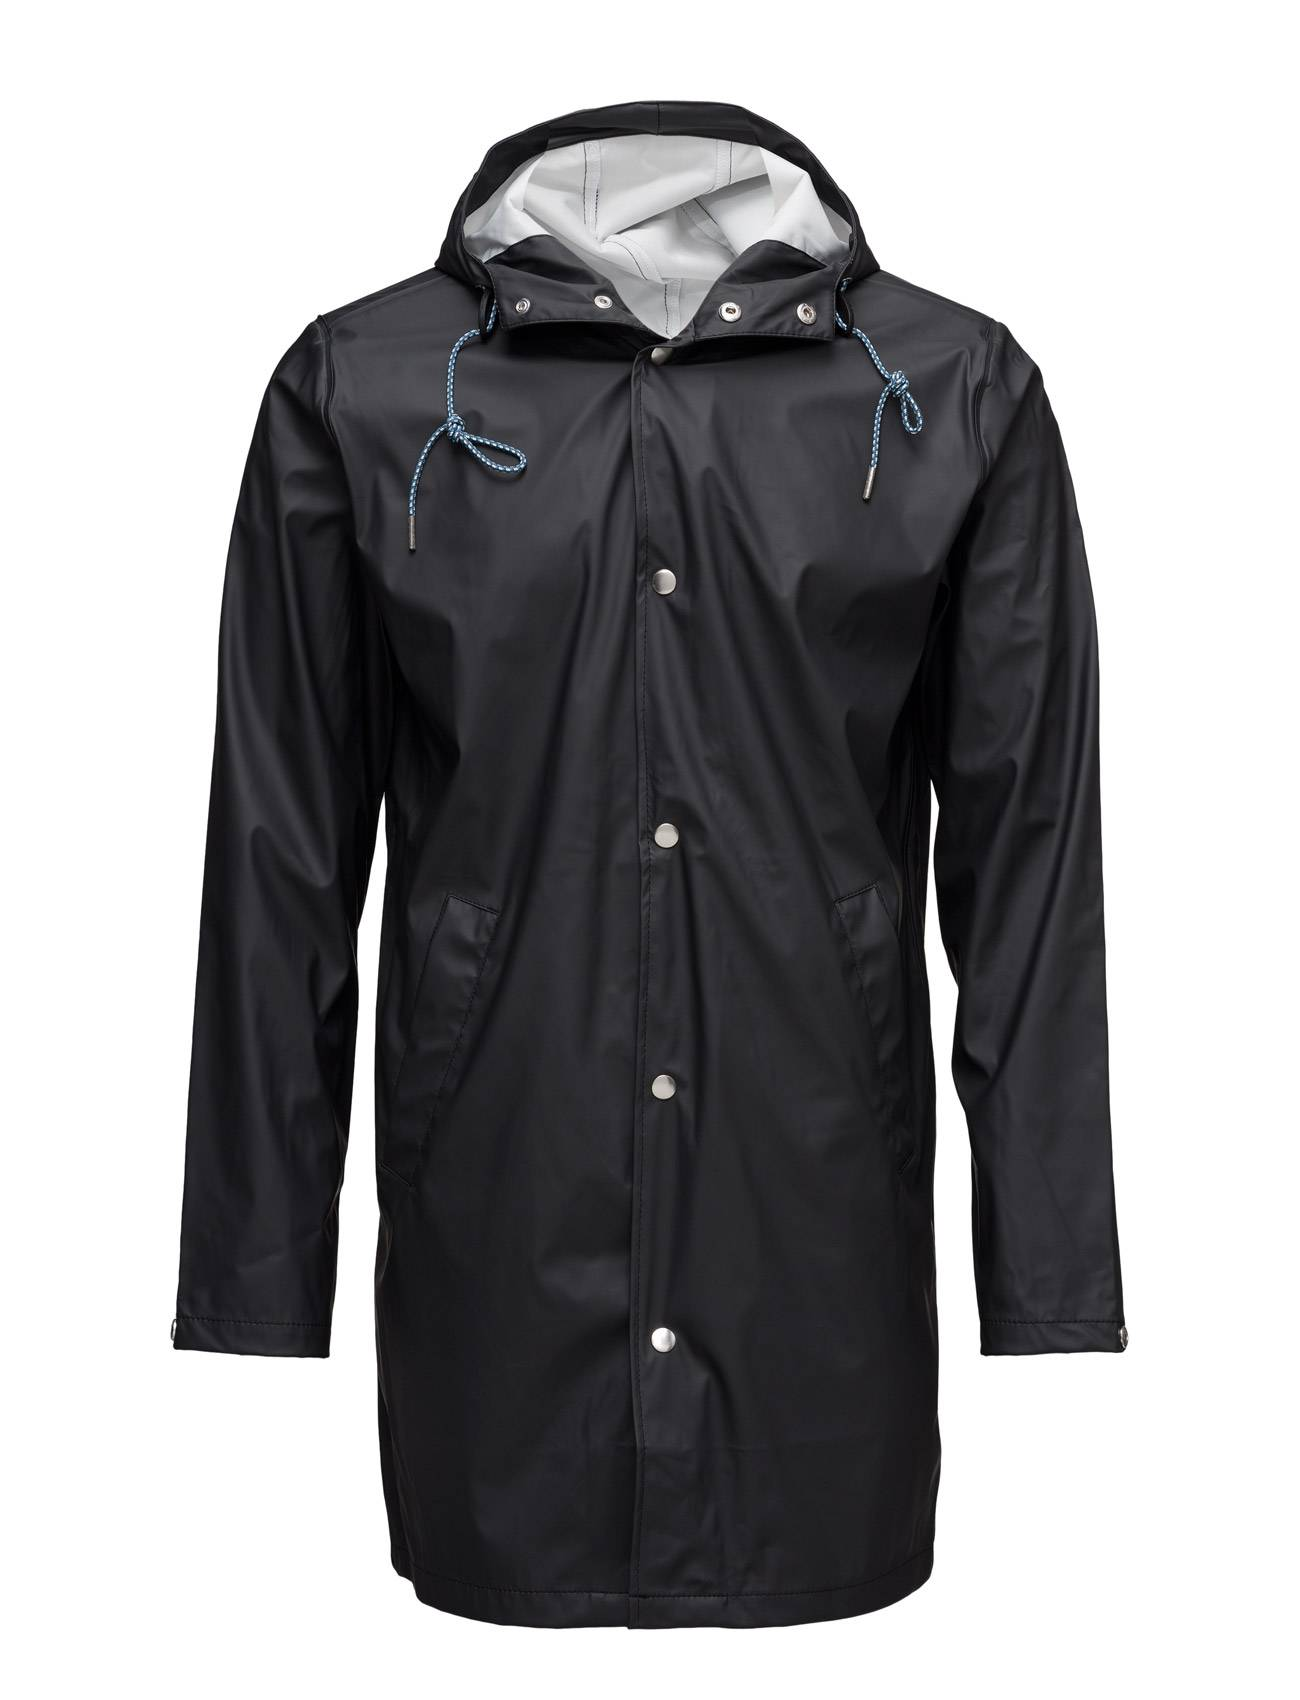 Knowledge Cotton Apparel Long Rain Jacket